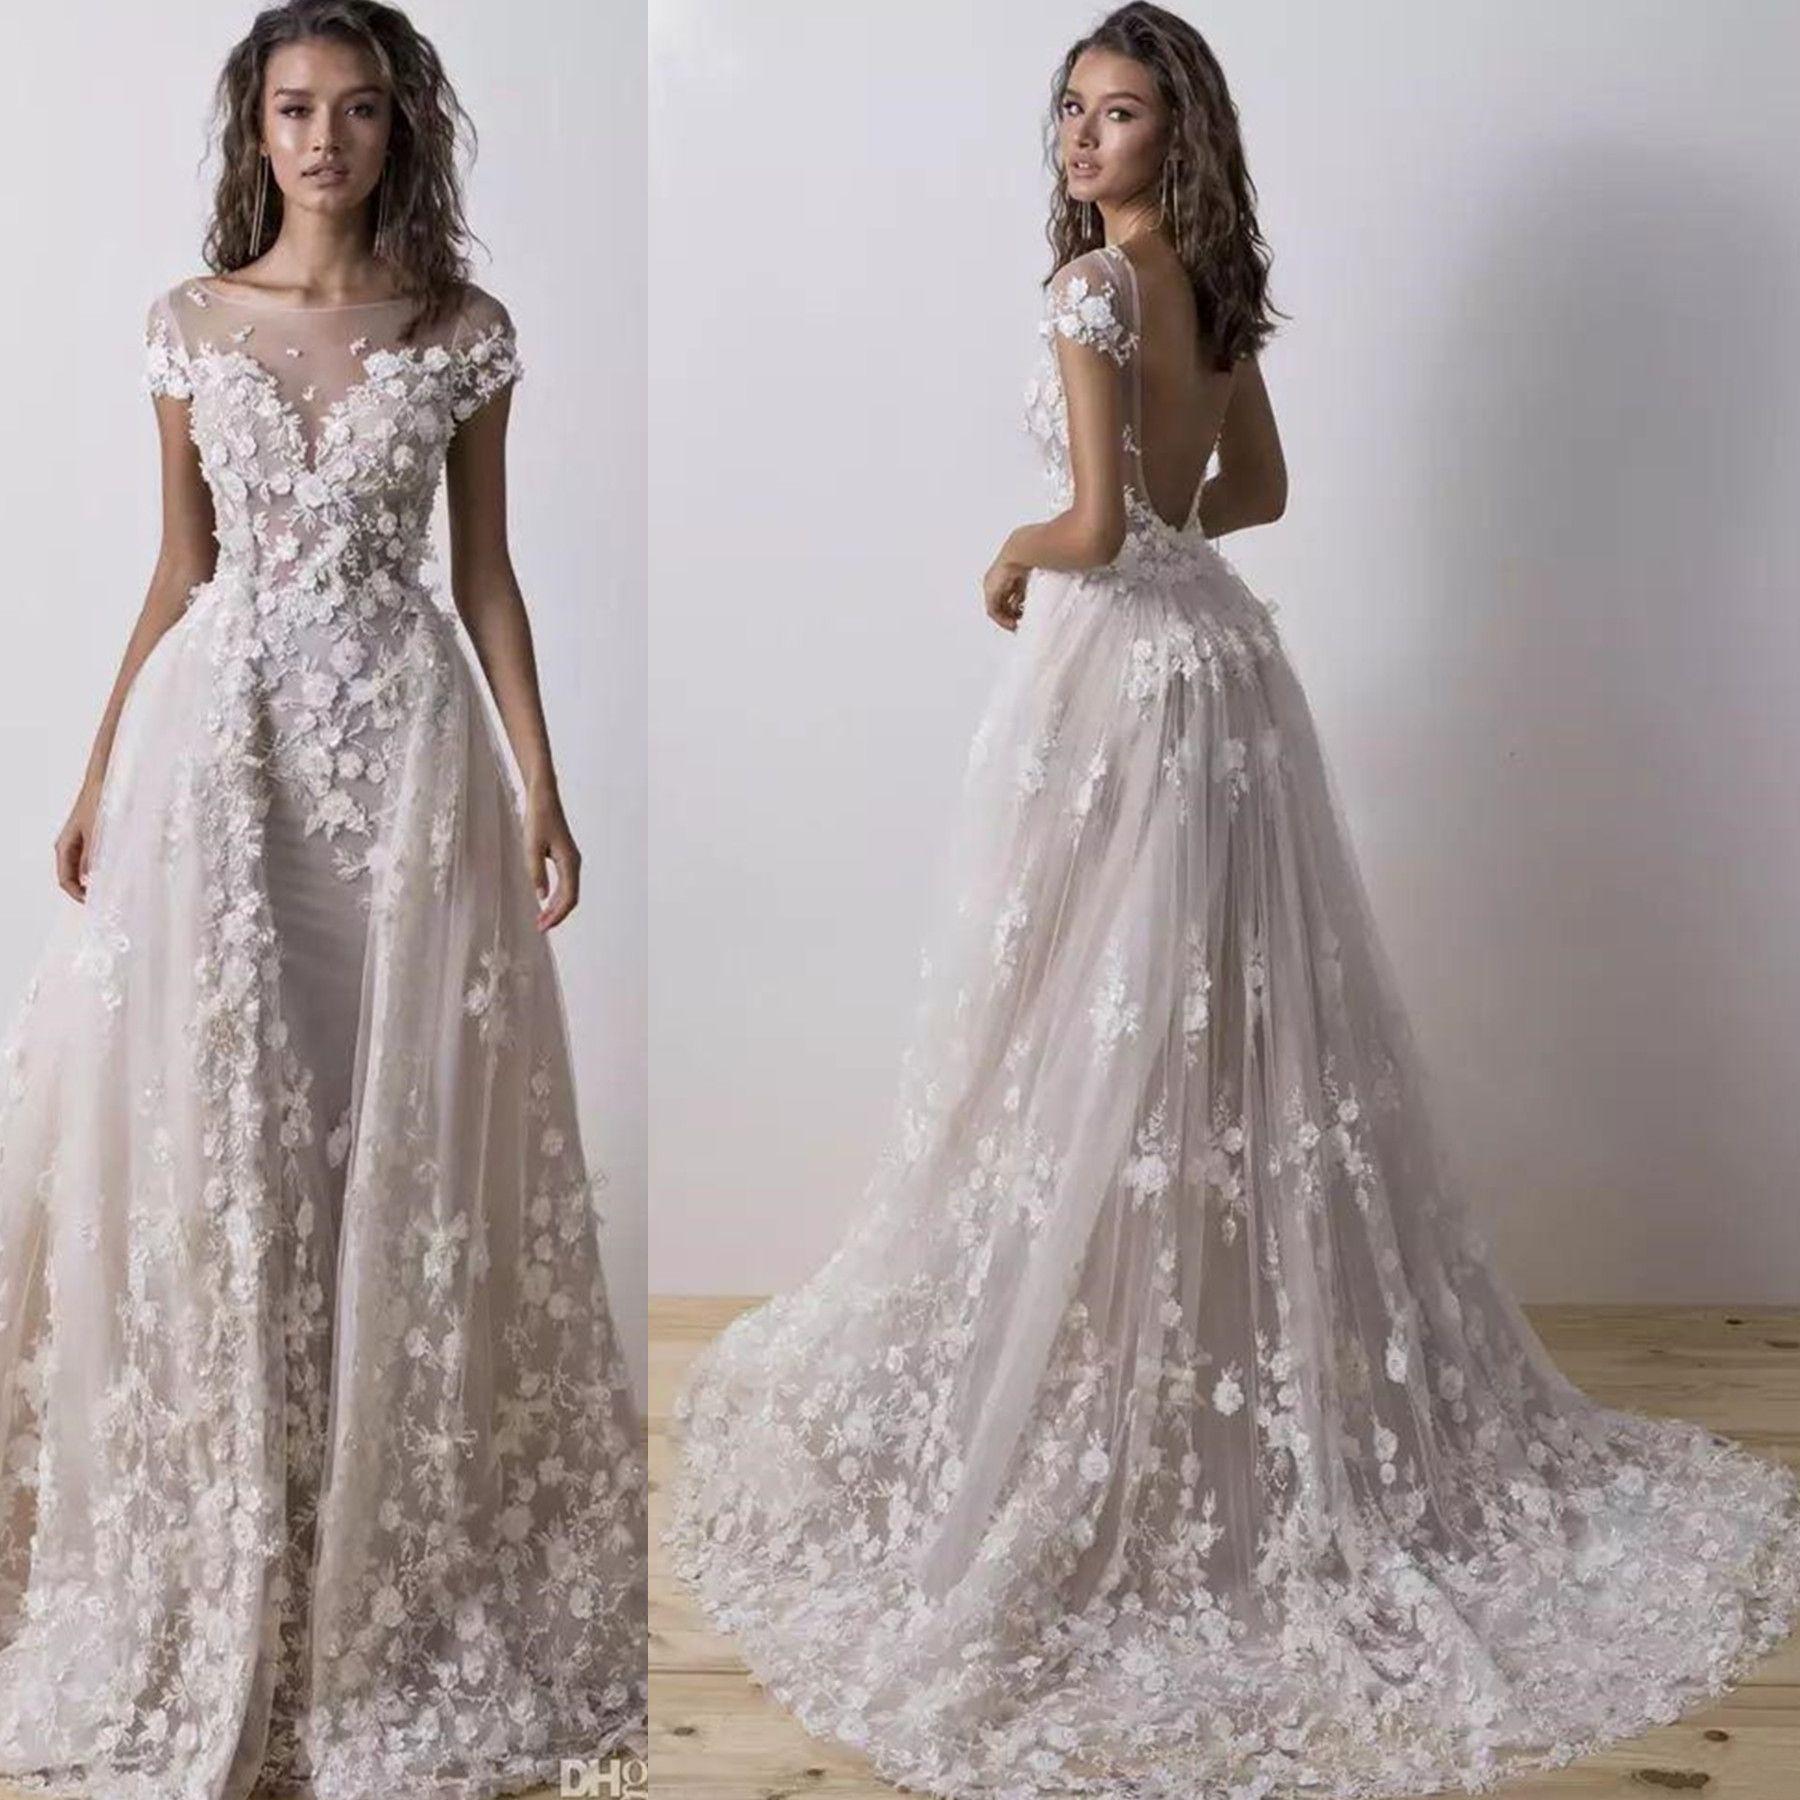 5cd8b9b9a7 Cheap Lebanon Wedding Dress Discount Rhinestone Sequin Mermaid Wedding Dress